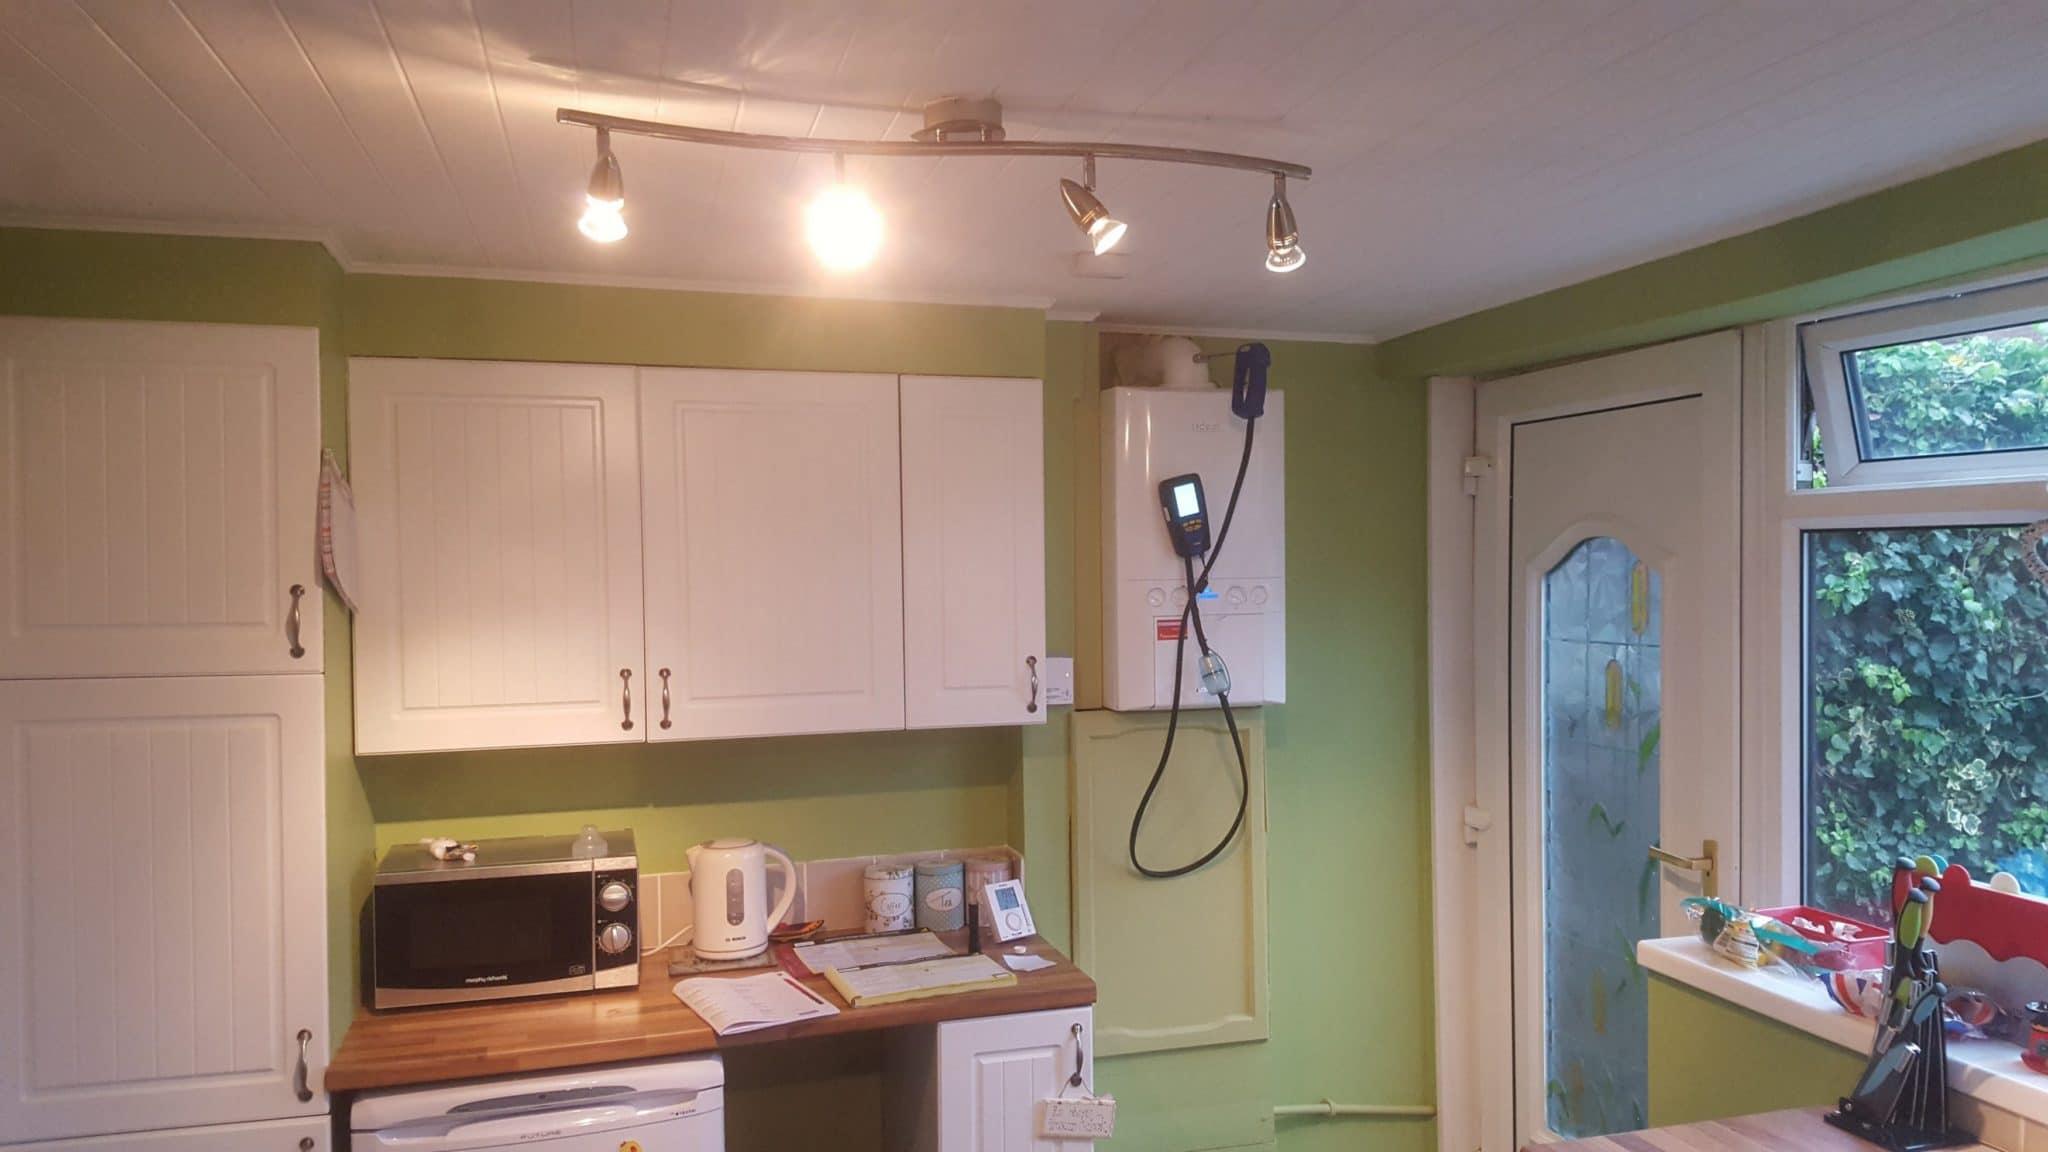 Combi Boiler Installations Plumber Newcastle